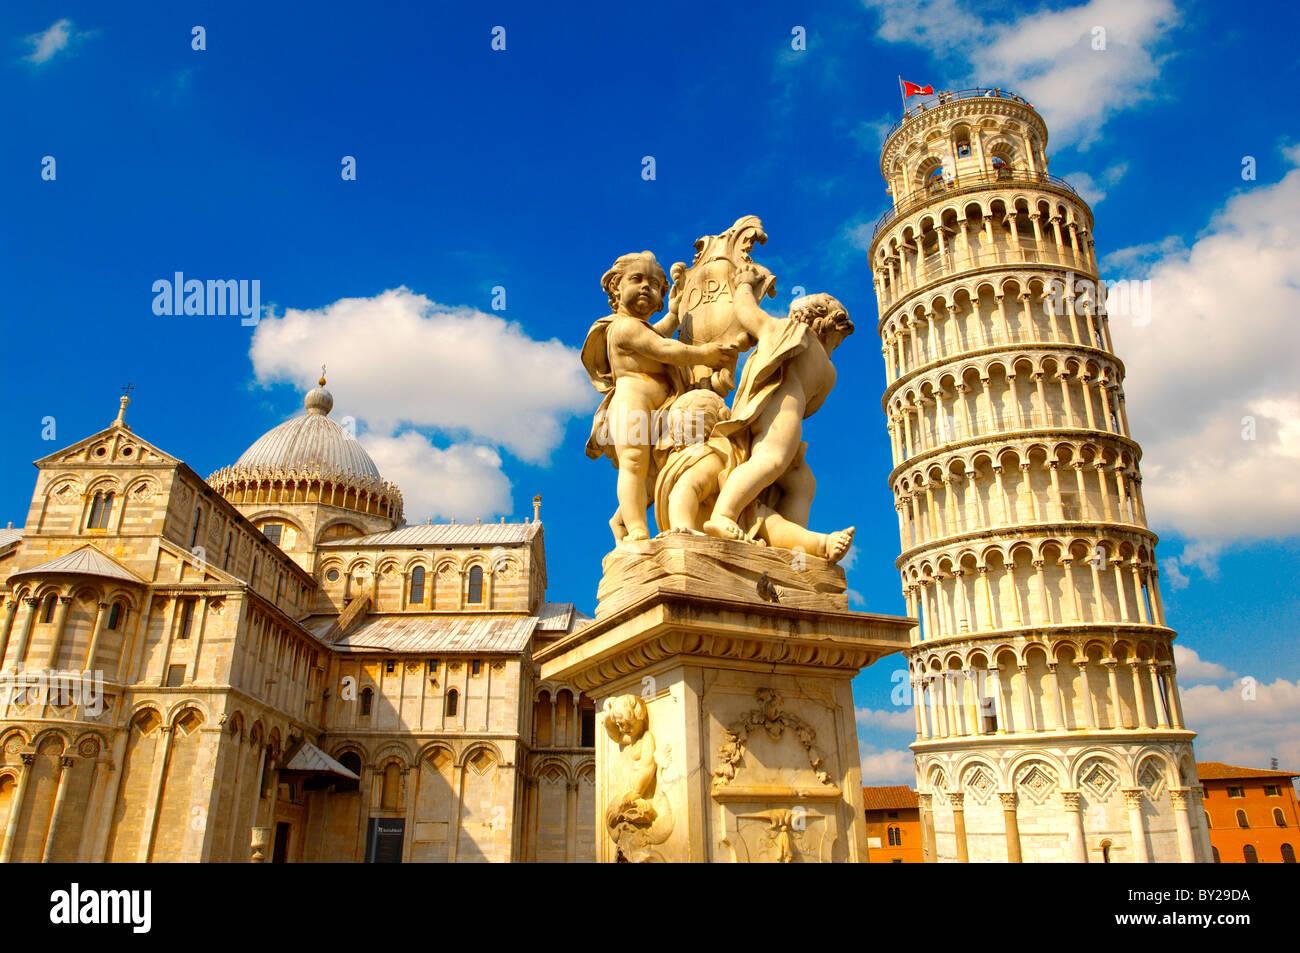 Catherderal y torre inclinada - Piazza del Miracoli - Pisa - Italia Imagen De Stock